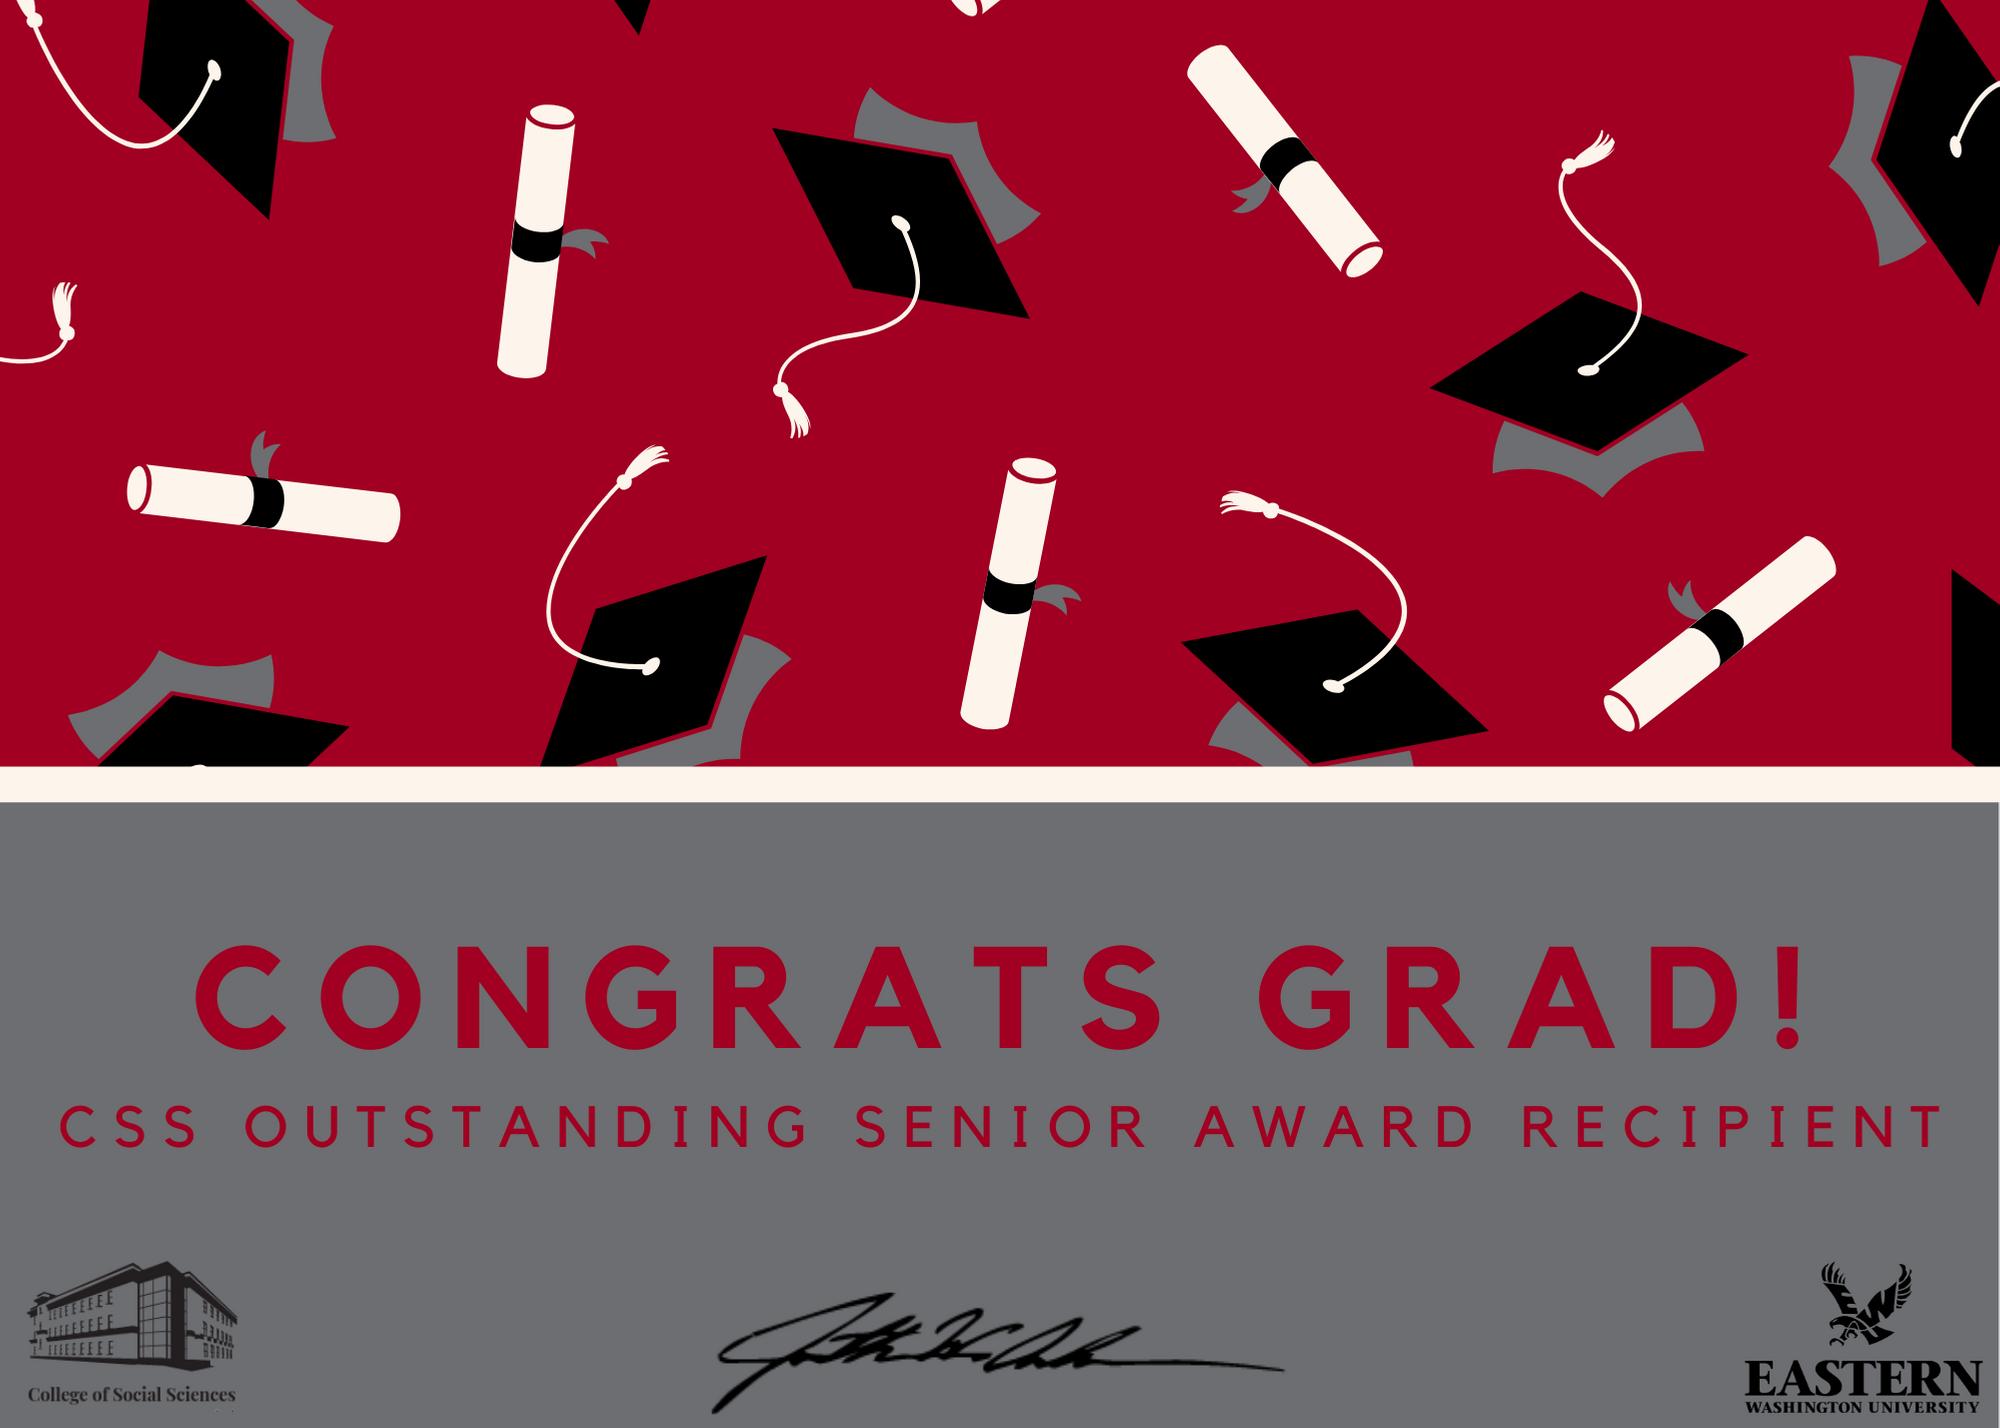 4142-caps-and-diplomas-pattern-graduation-card-2.png